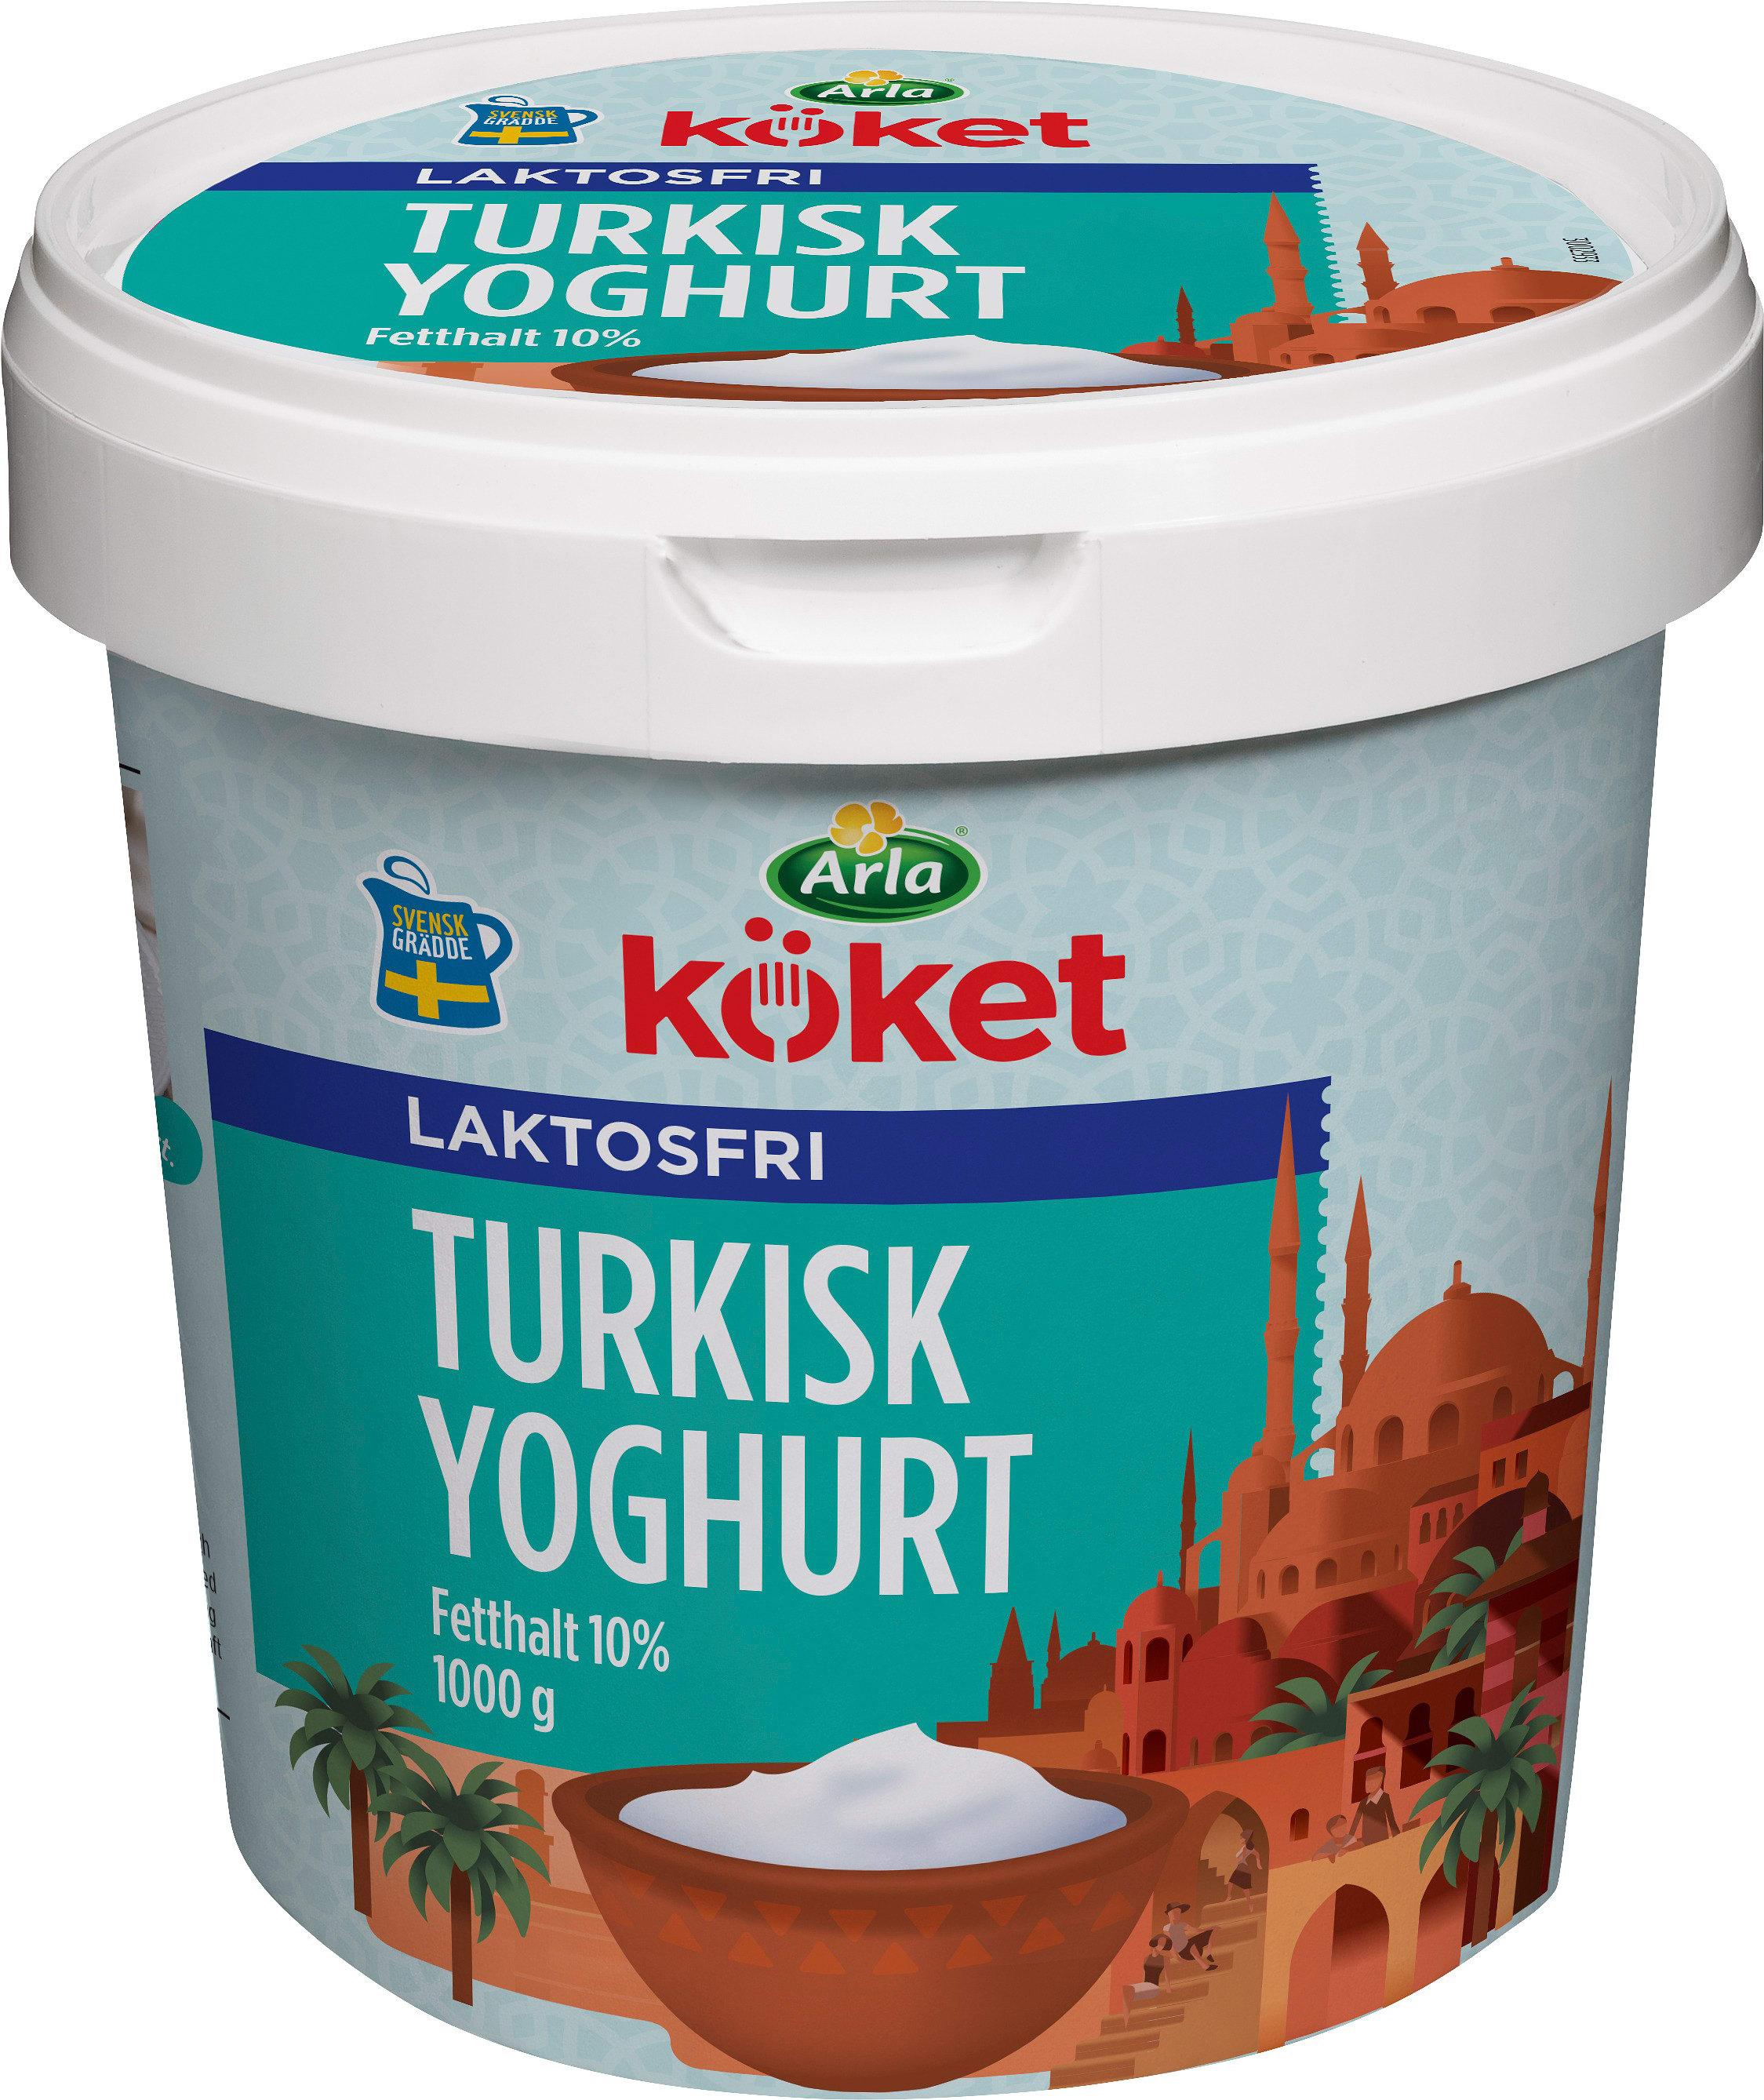 turkisk eller grekisk yoghurt